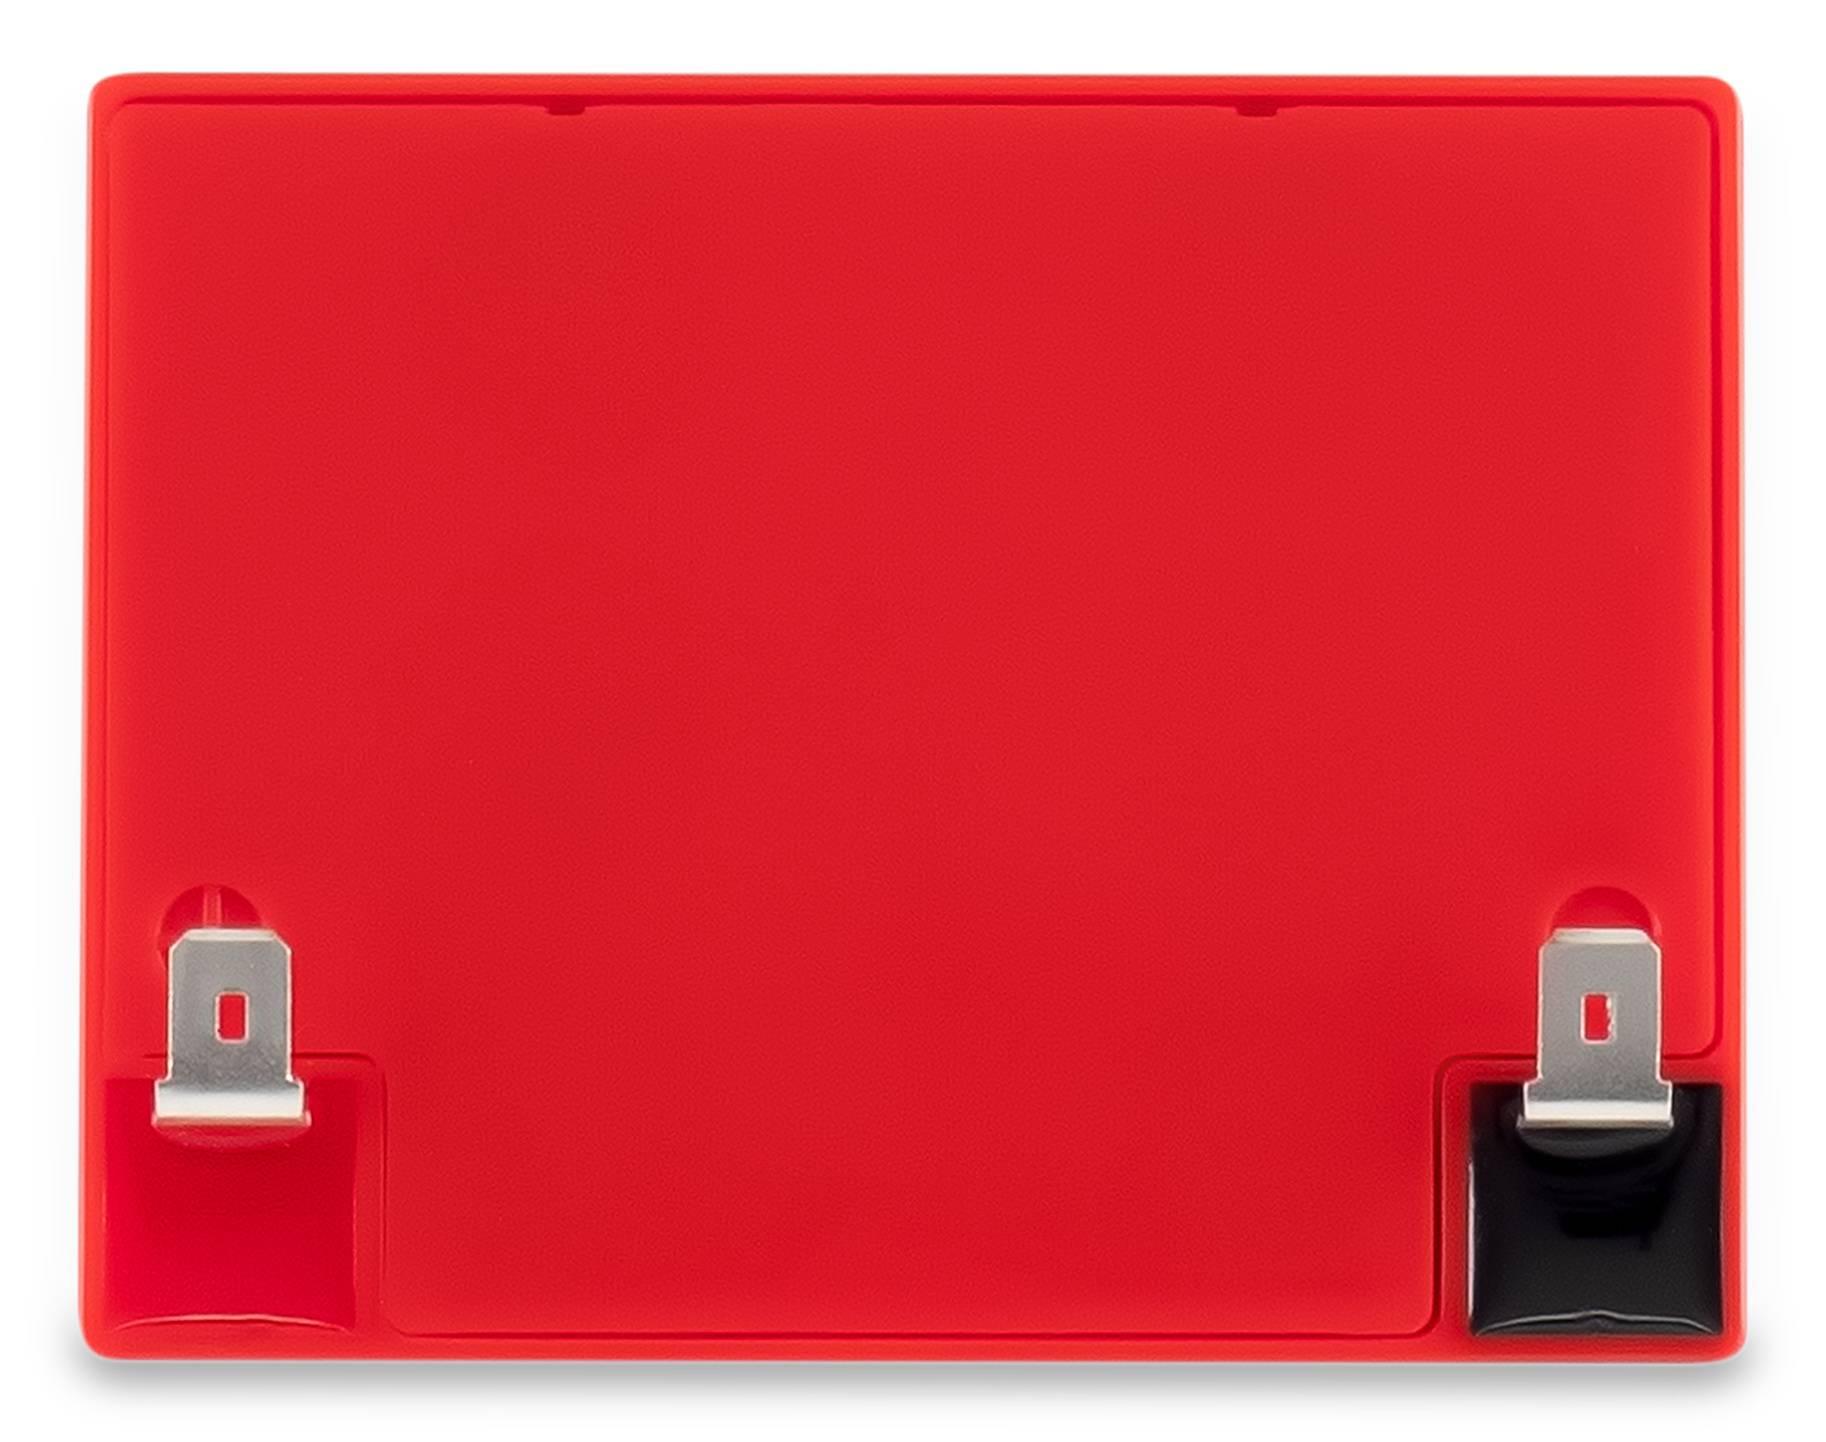 Батарея для ИБП Ippon IP12-5, 12В, 5Ач - фото 4